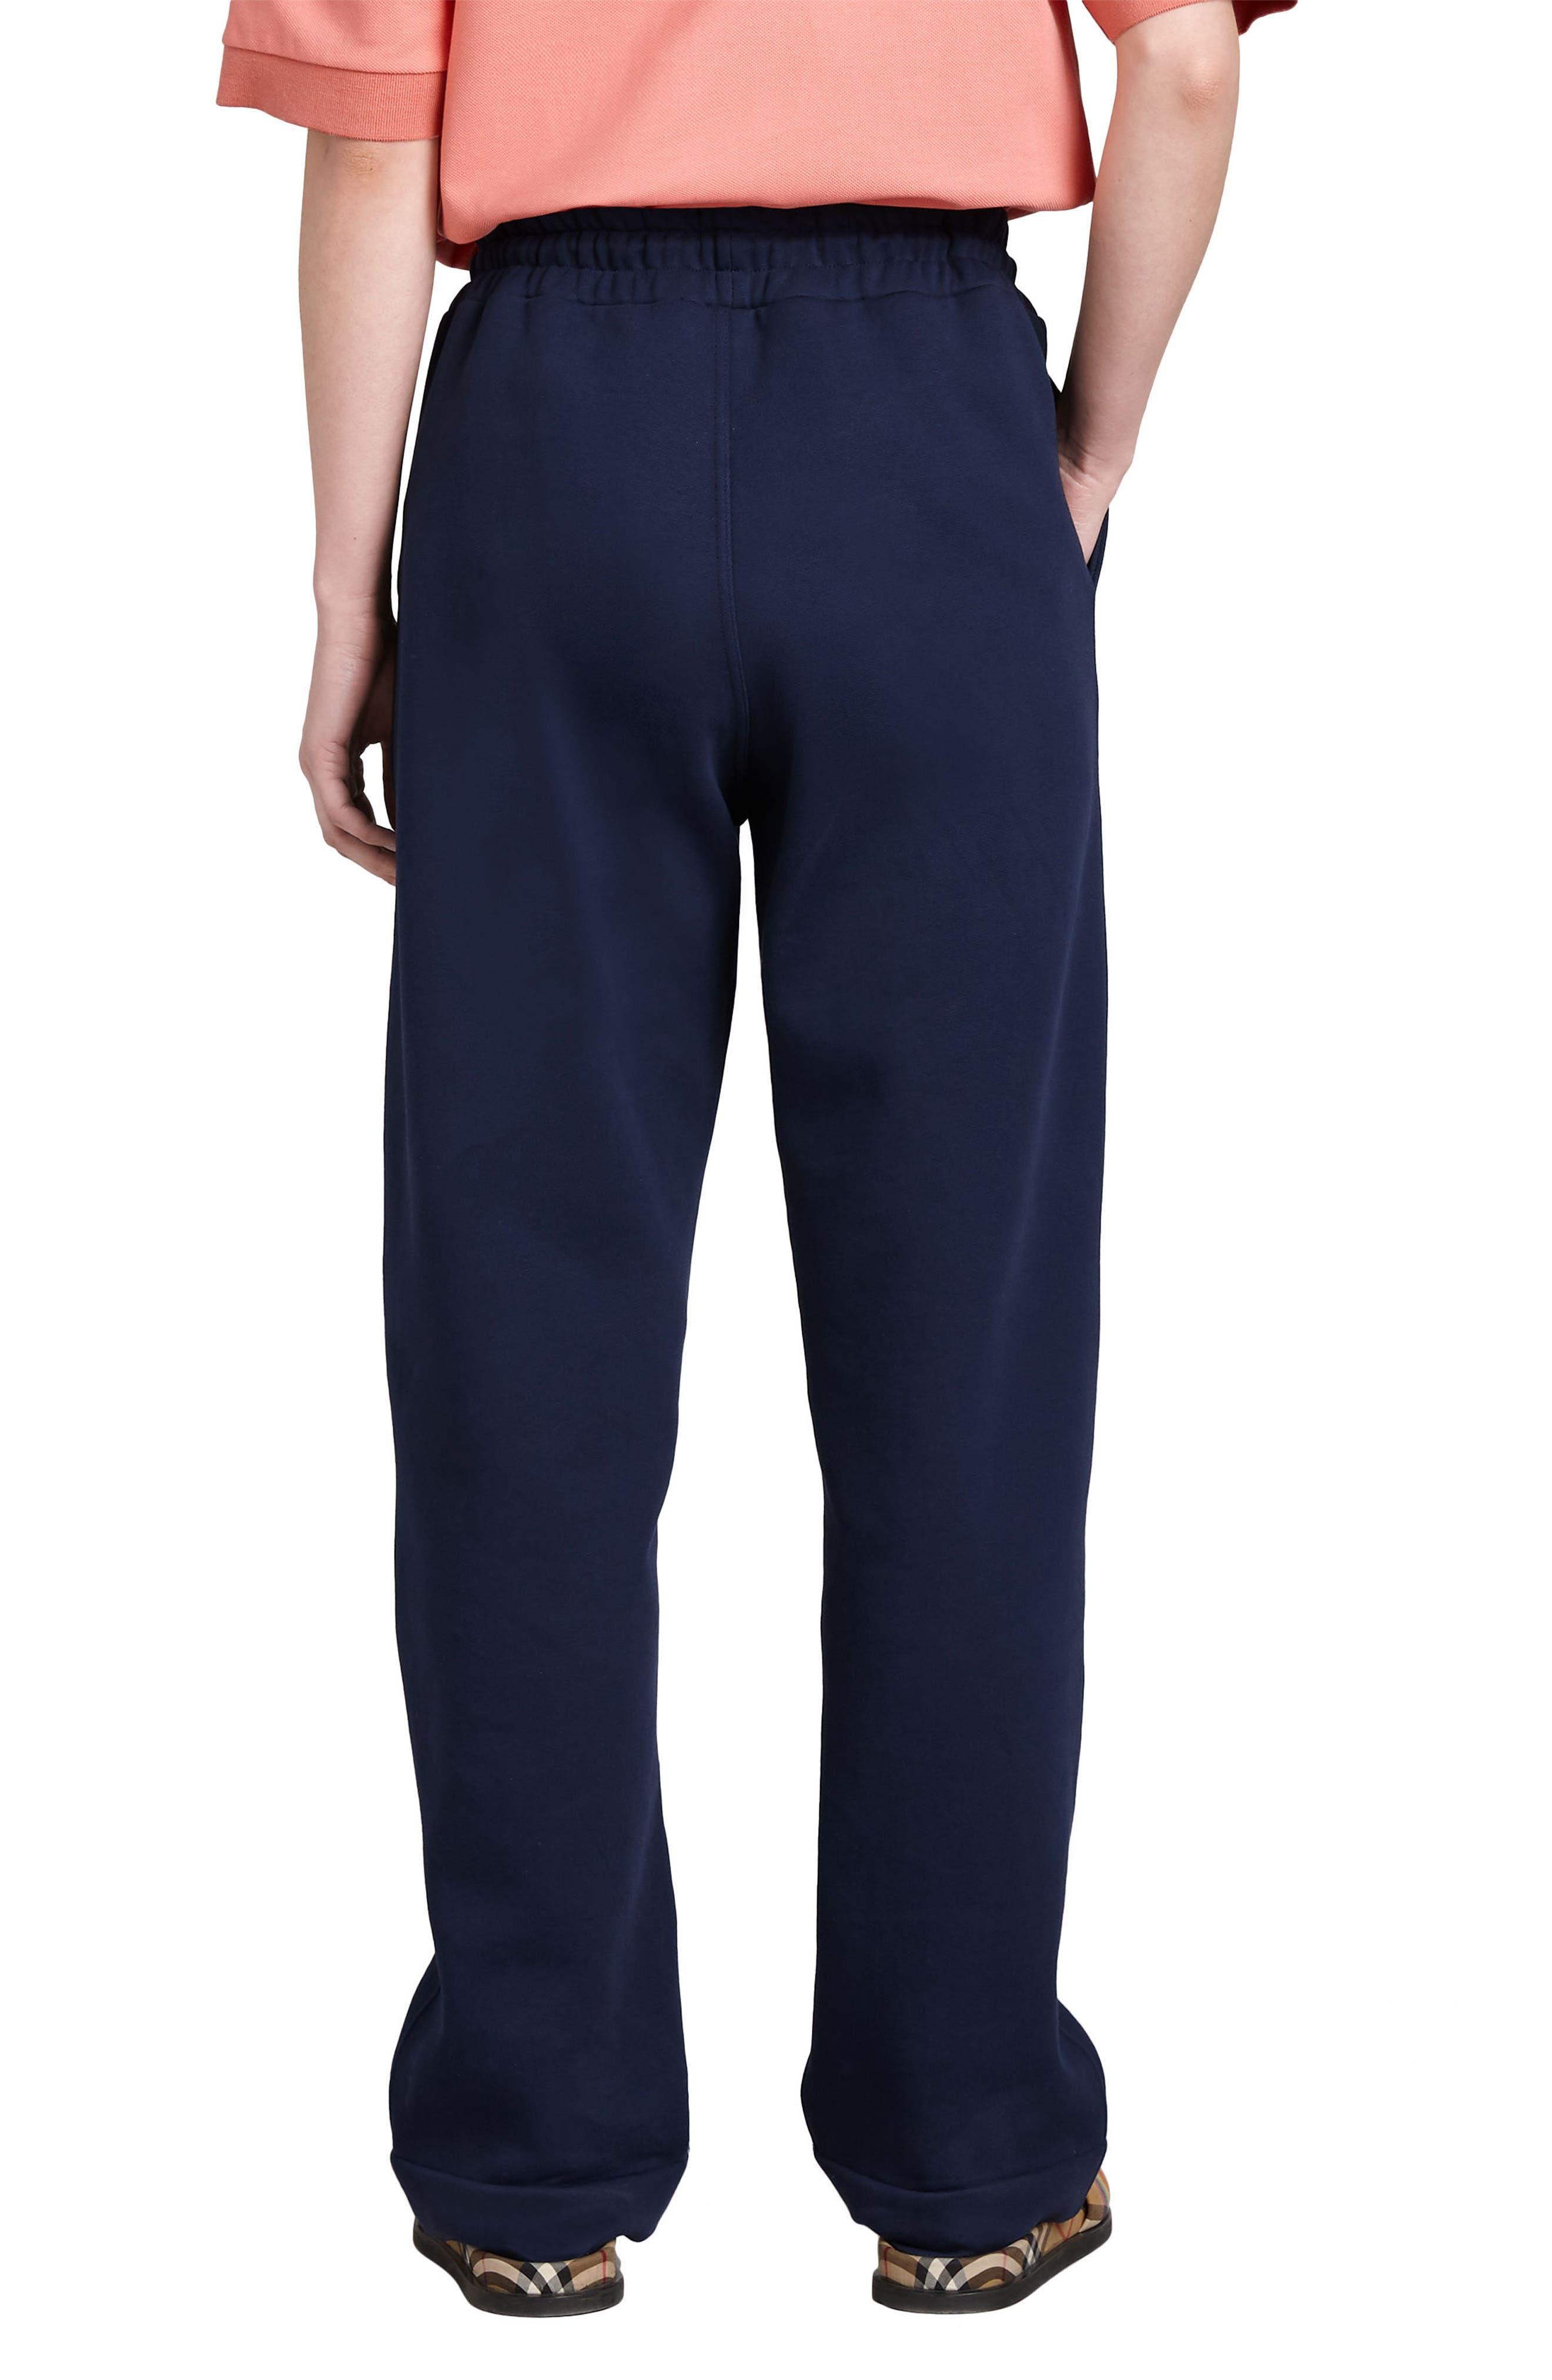 Vintage Crest Sweatpants,                             Alternate thumbnail 2, color,                             MIDNIGHT BLUE